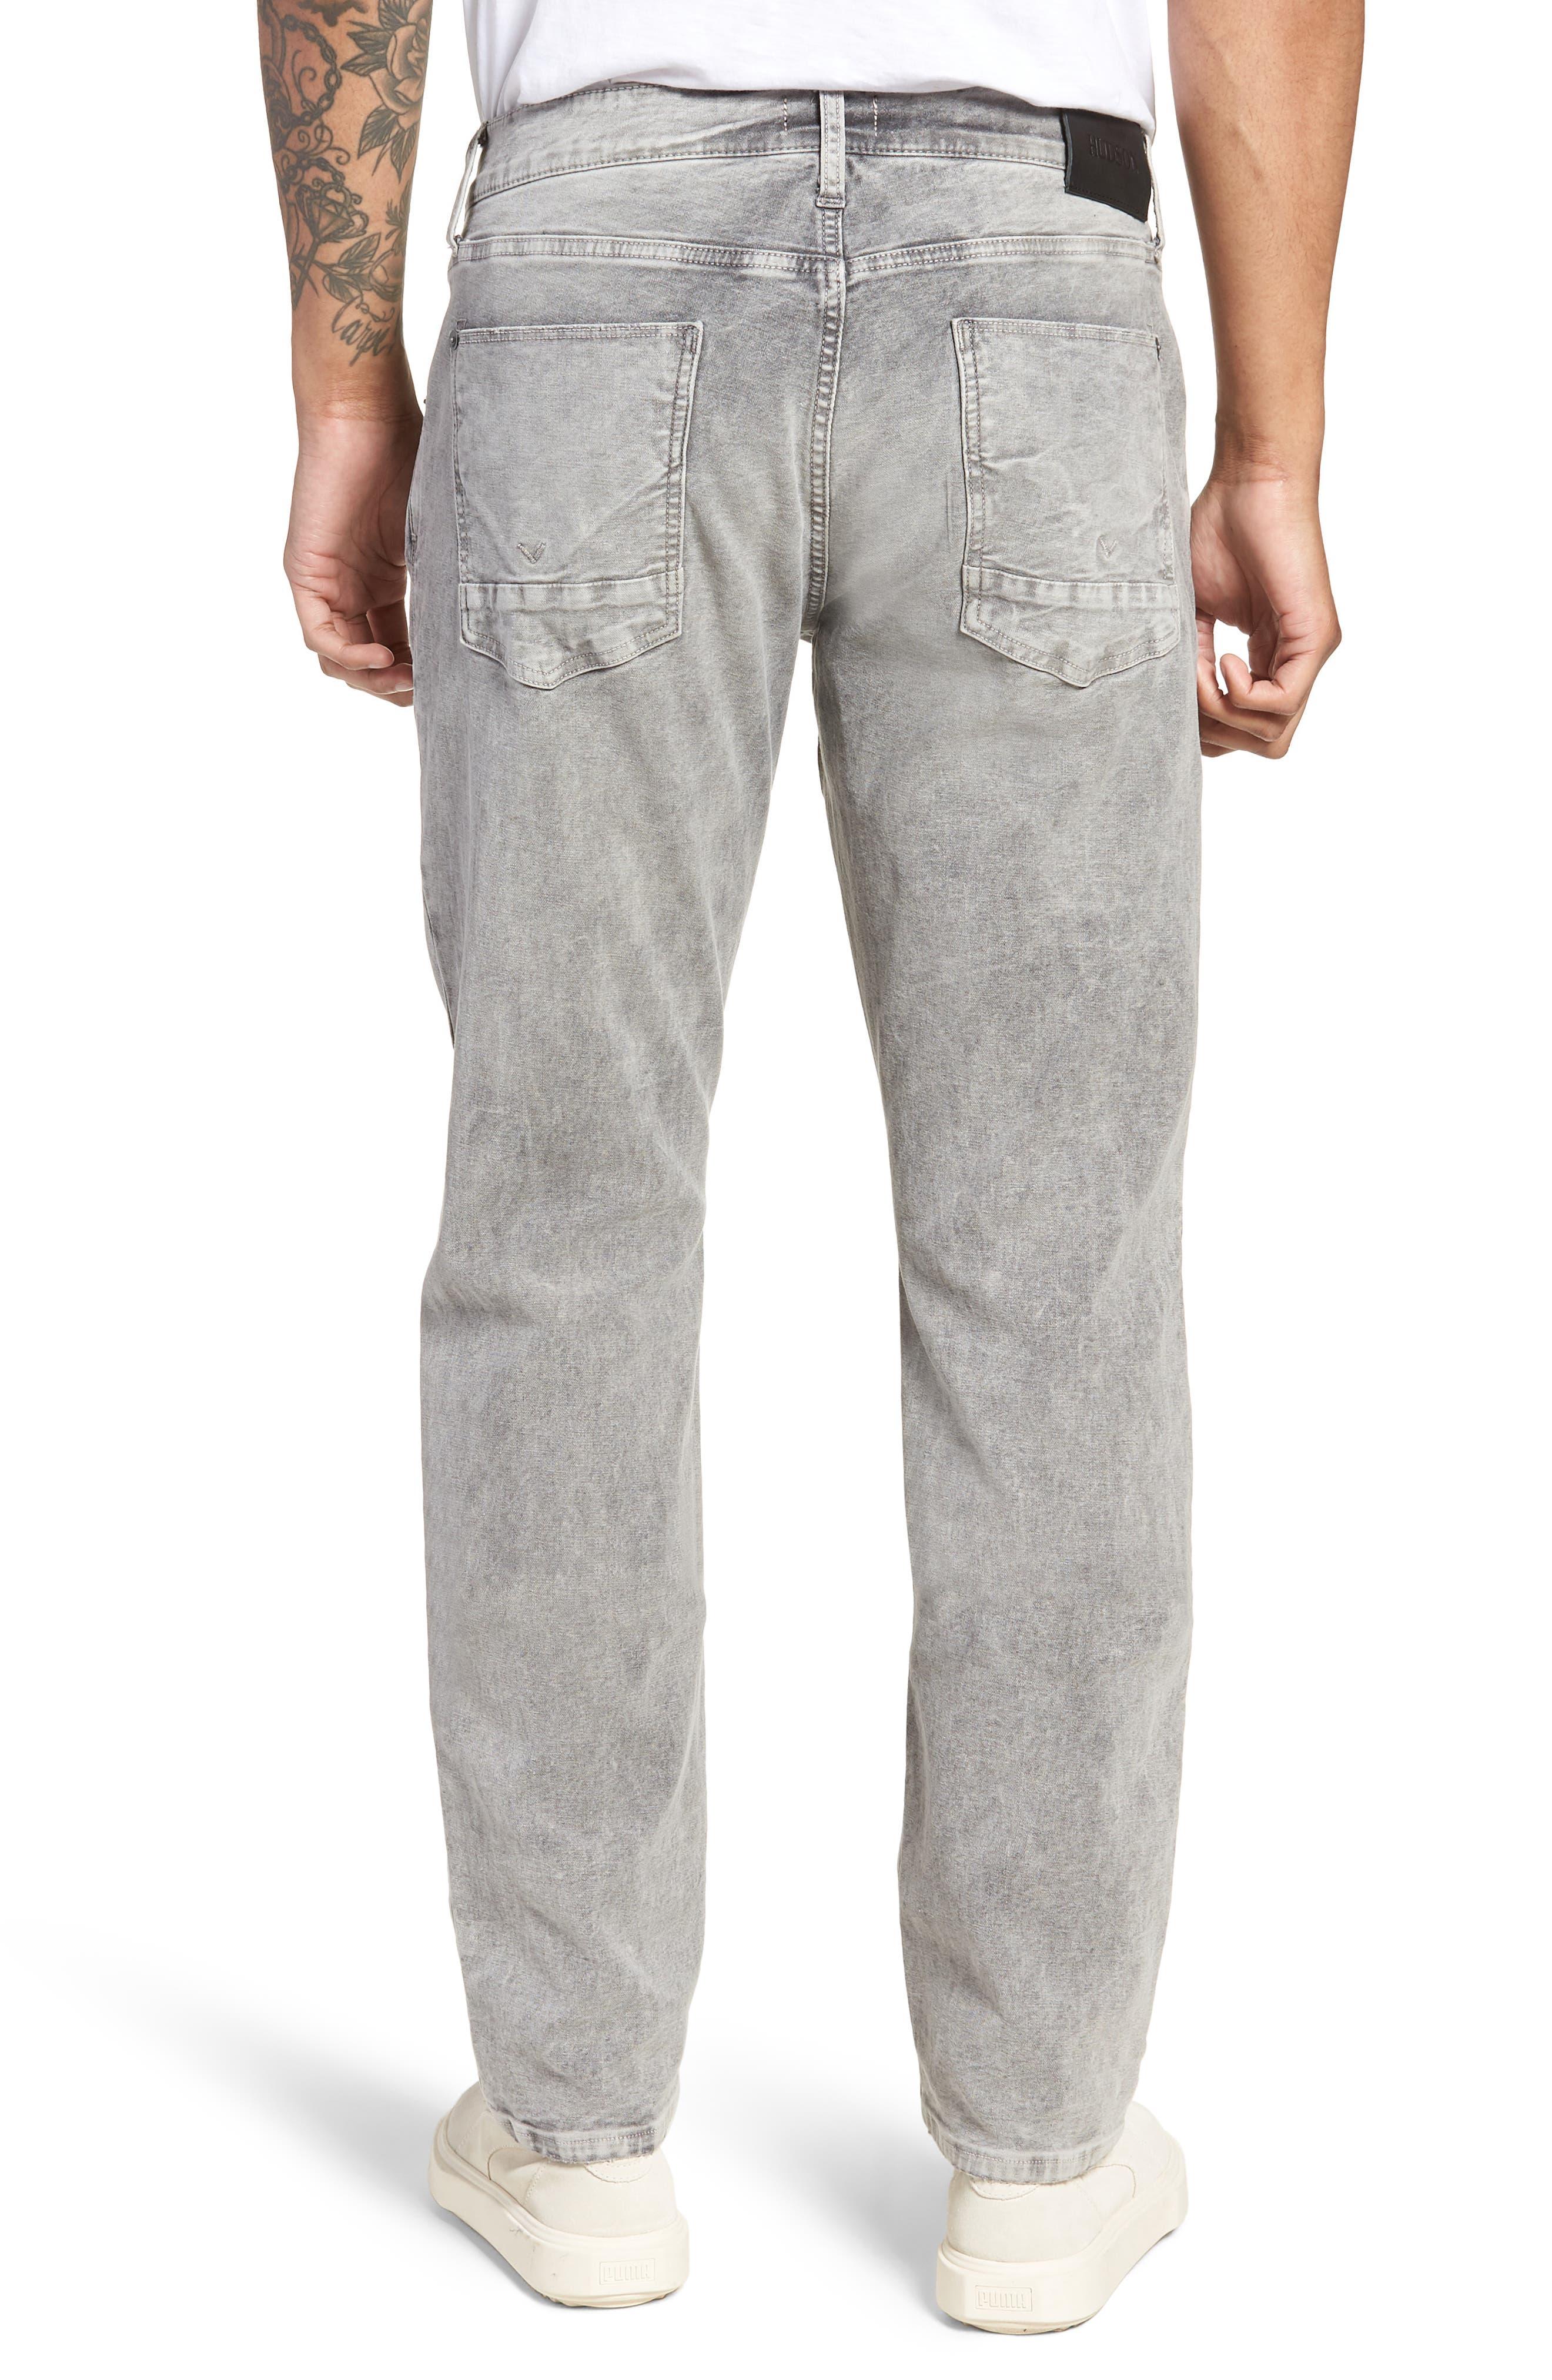 Blake Slim Fit Jeans,                             Alternate thumbnail 2, color,                             Deceiving